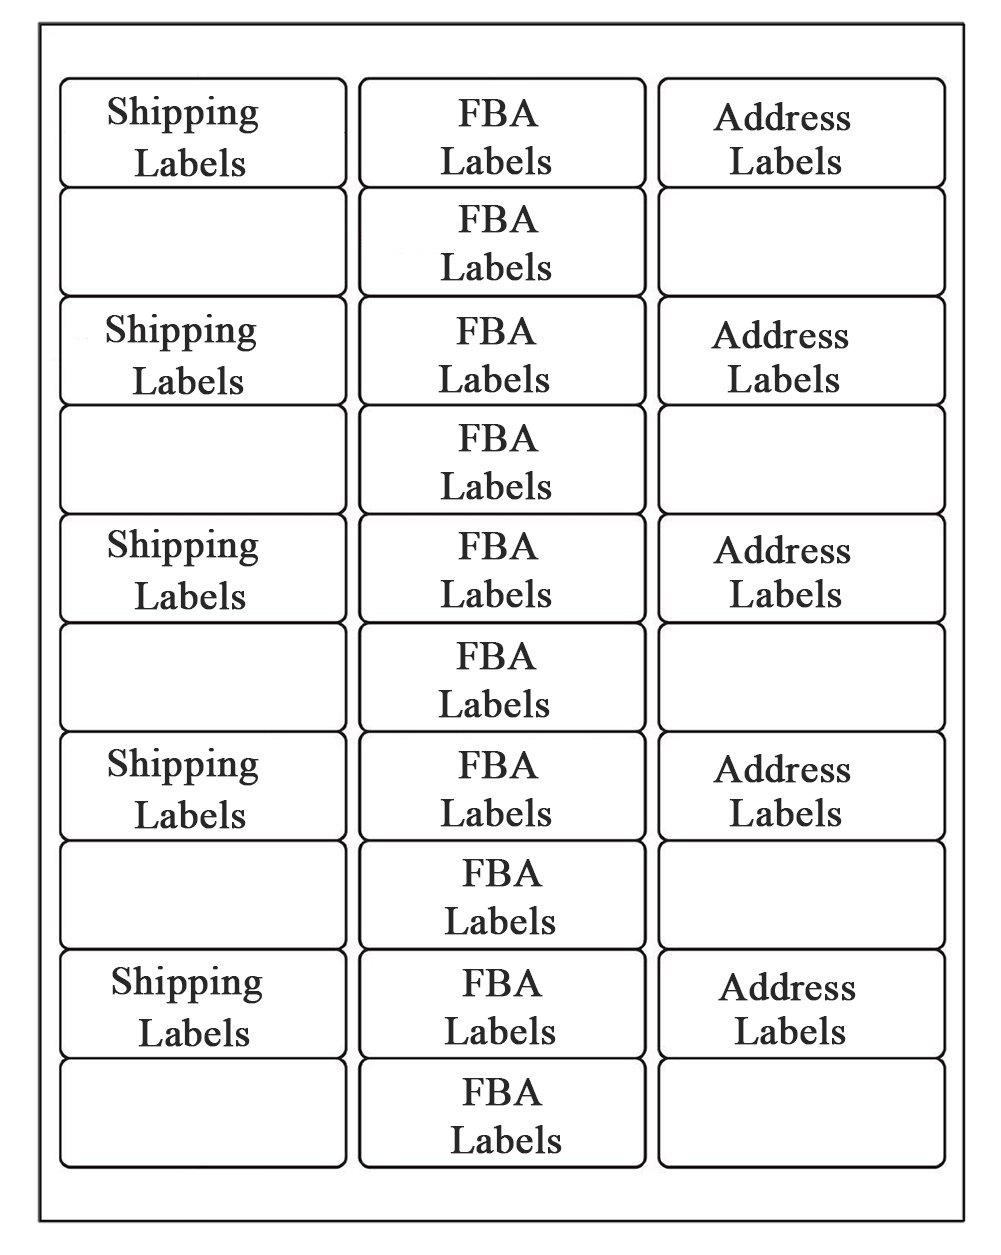 SJPACK 30-up Labels Address Labels 1'' x 2-5/8'' White Mailing Labels for Laser Inkjet Printers, 500 Sheets by SJPACK